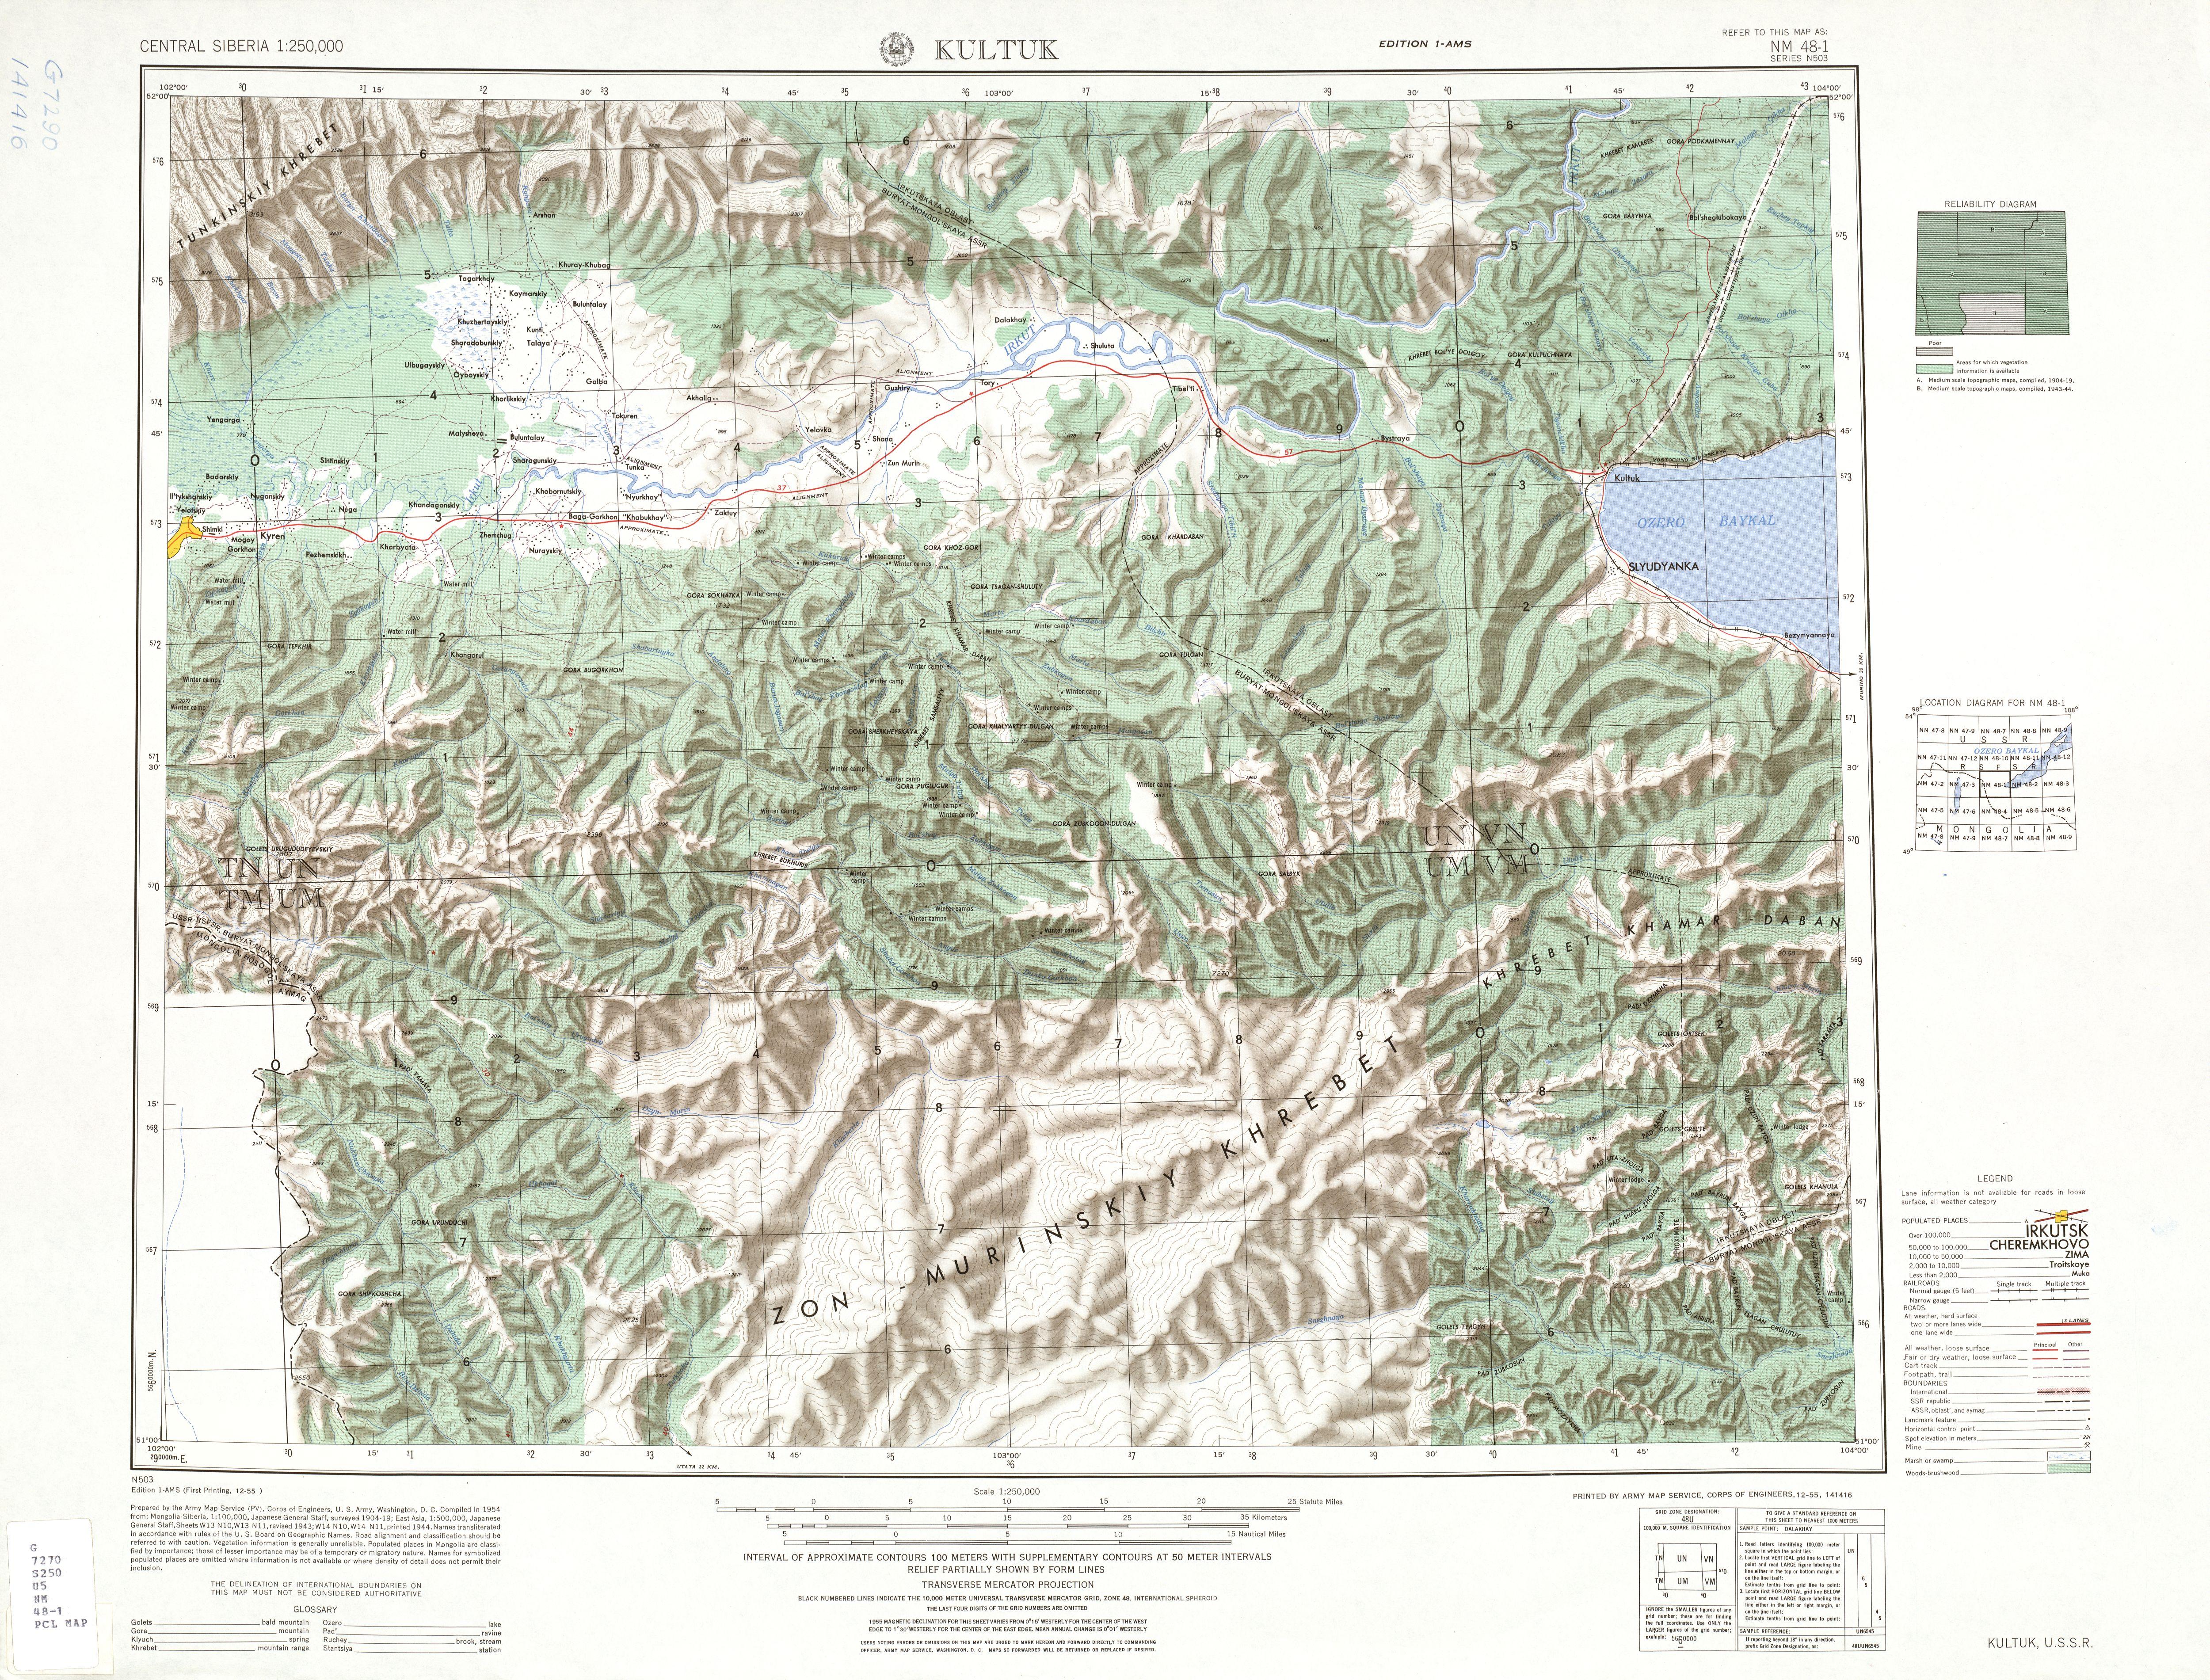 nm  kultuk . central siberia ams topographic maps  perrycastañeda map